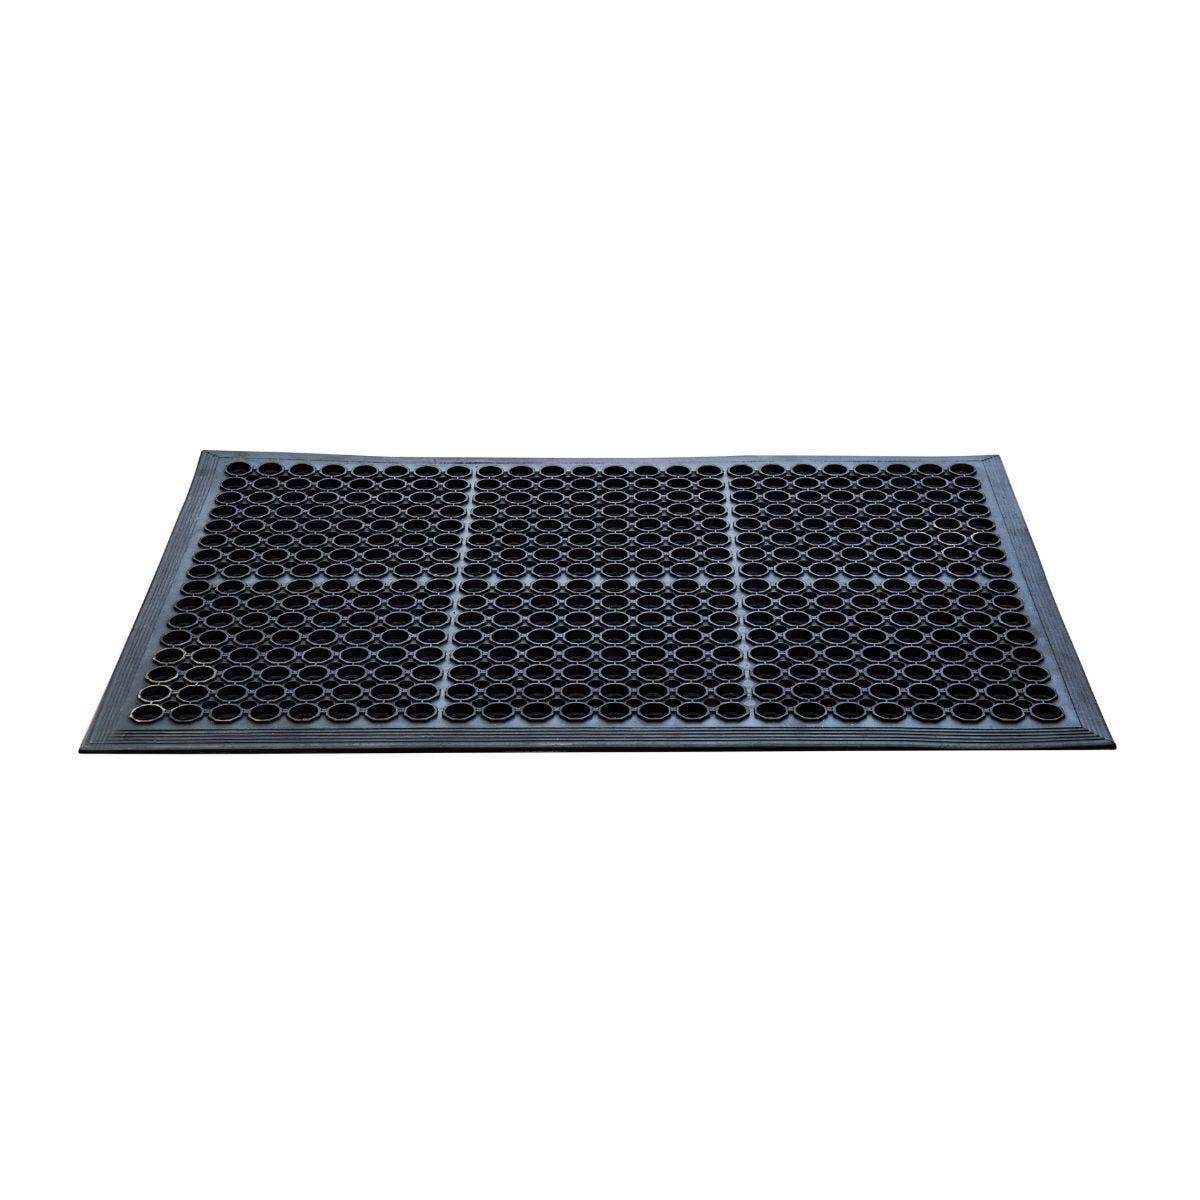 Doortex Open-Top Anti-Fatigue Mat 90 x 150cm Black